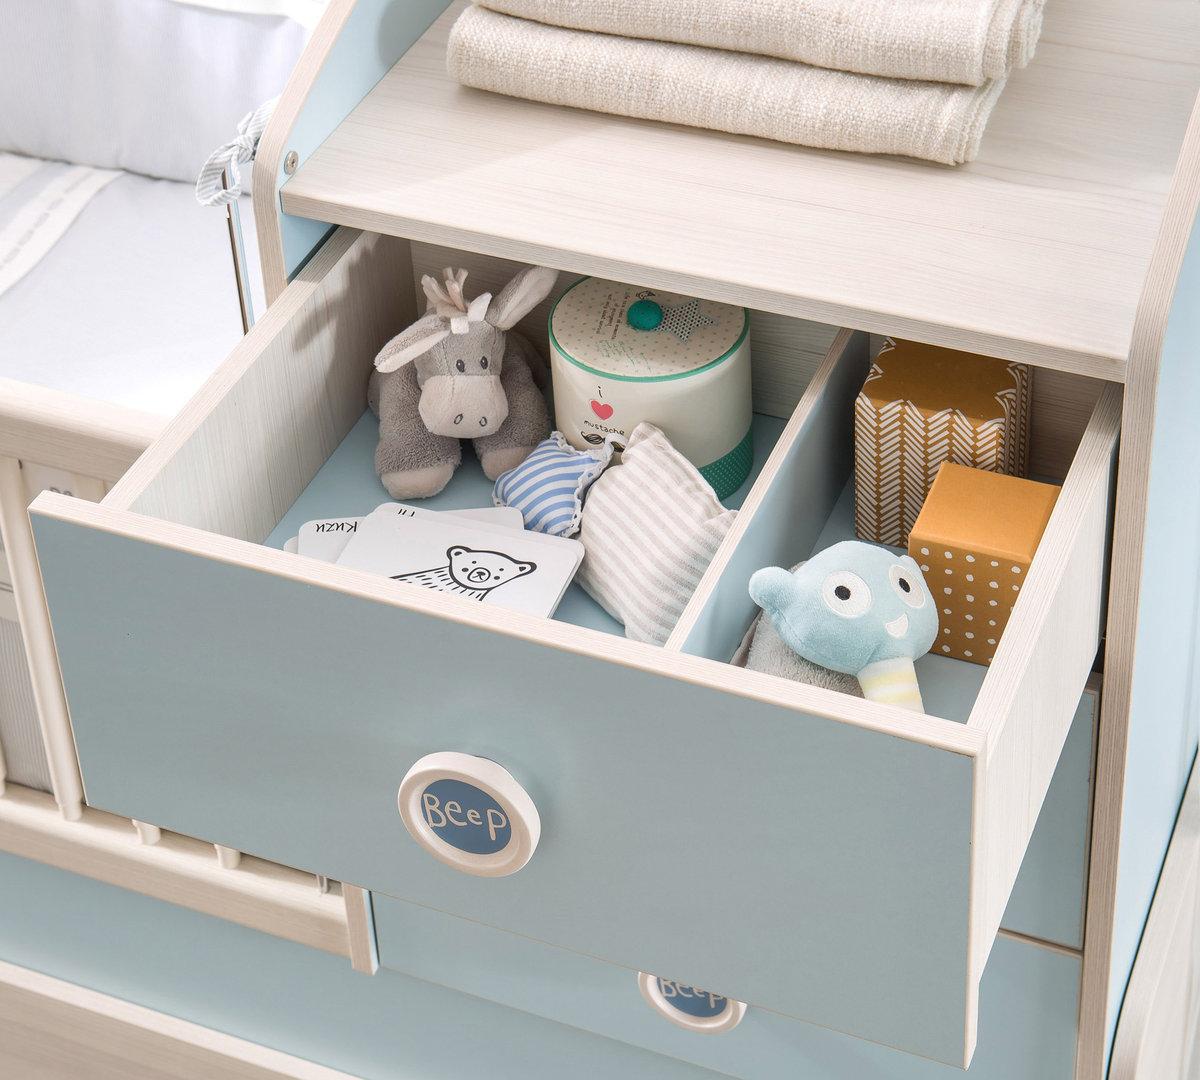 kombi babybett babyblue classic 4 teilig umbaubar bymm. Black Bedroom Furniture Sets. Home Design Ideas